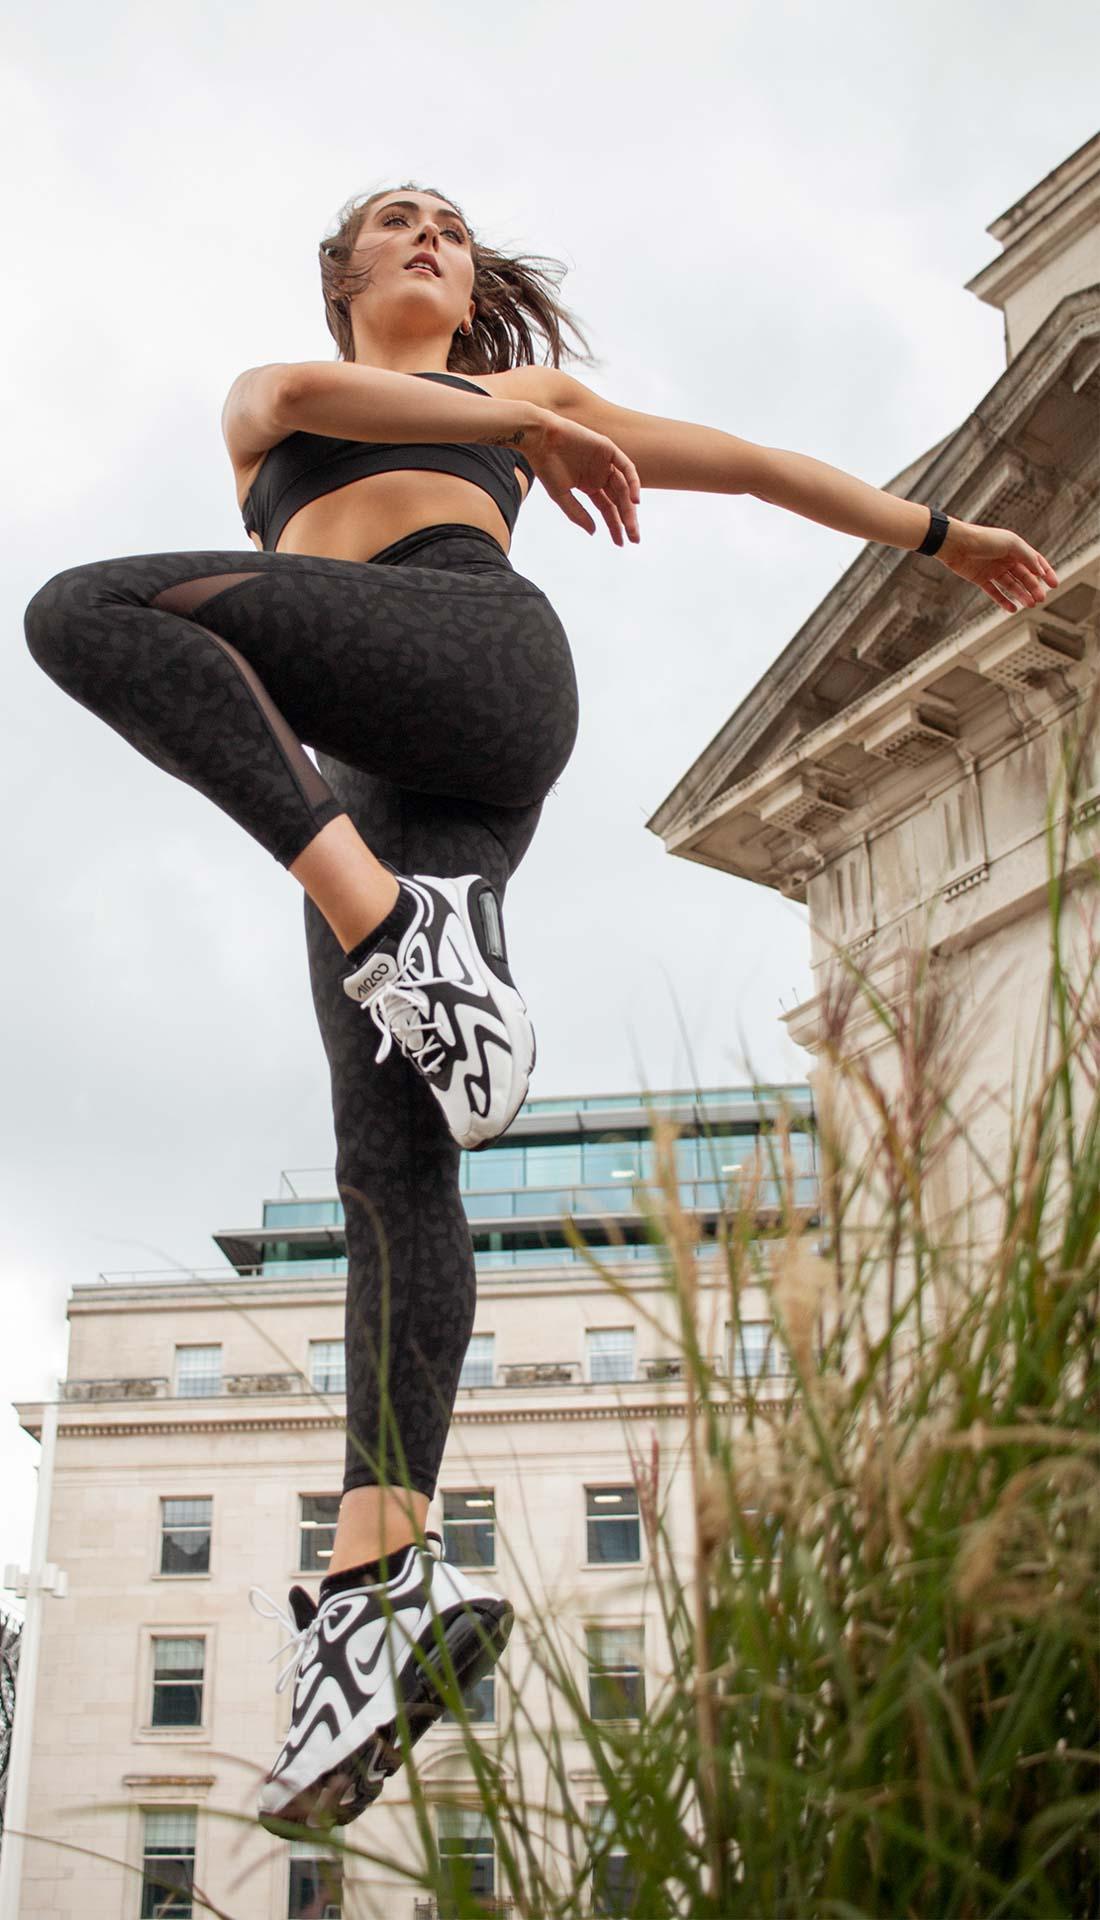 Dance photoshoot in Birmingham U.K. Centenary square